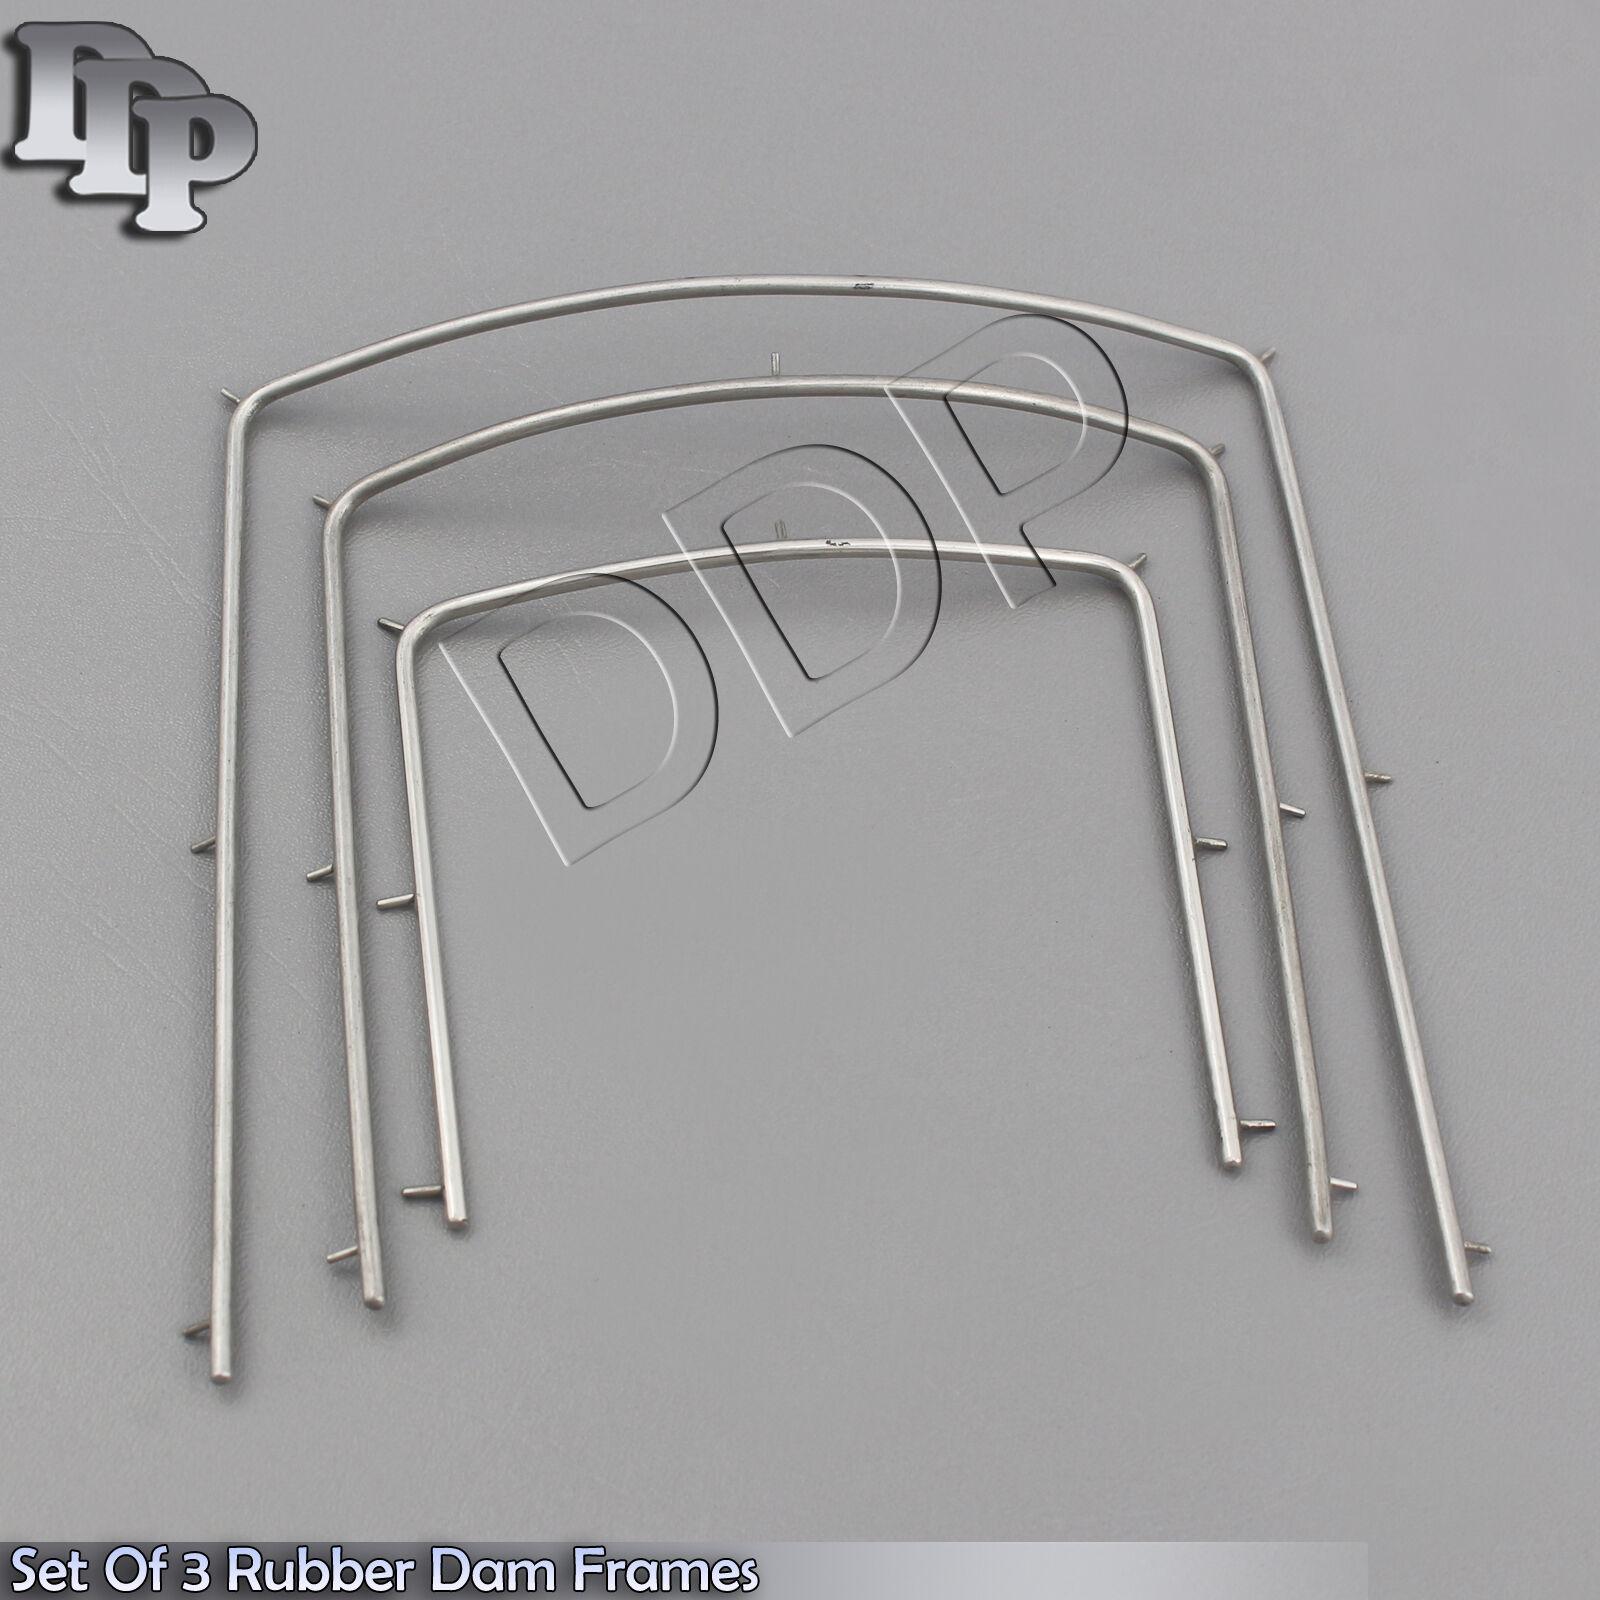 Set of 3 Rubber Dam Frames Small Medium Large Dental Endodontic ...